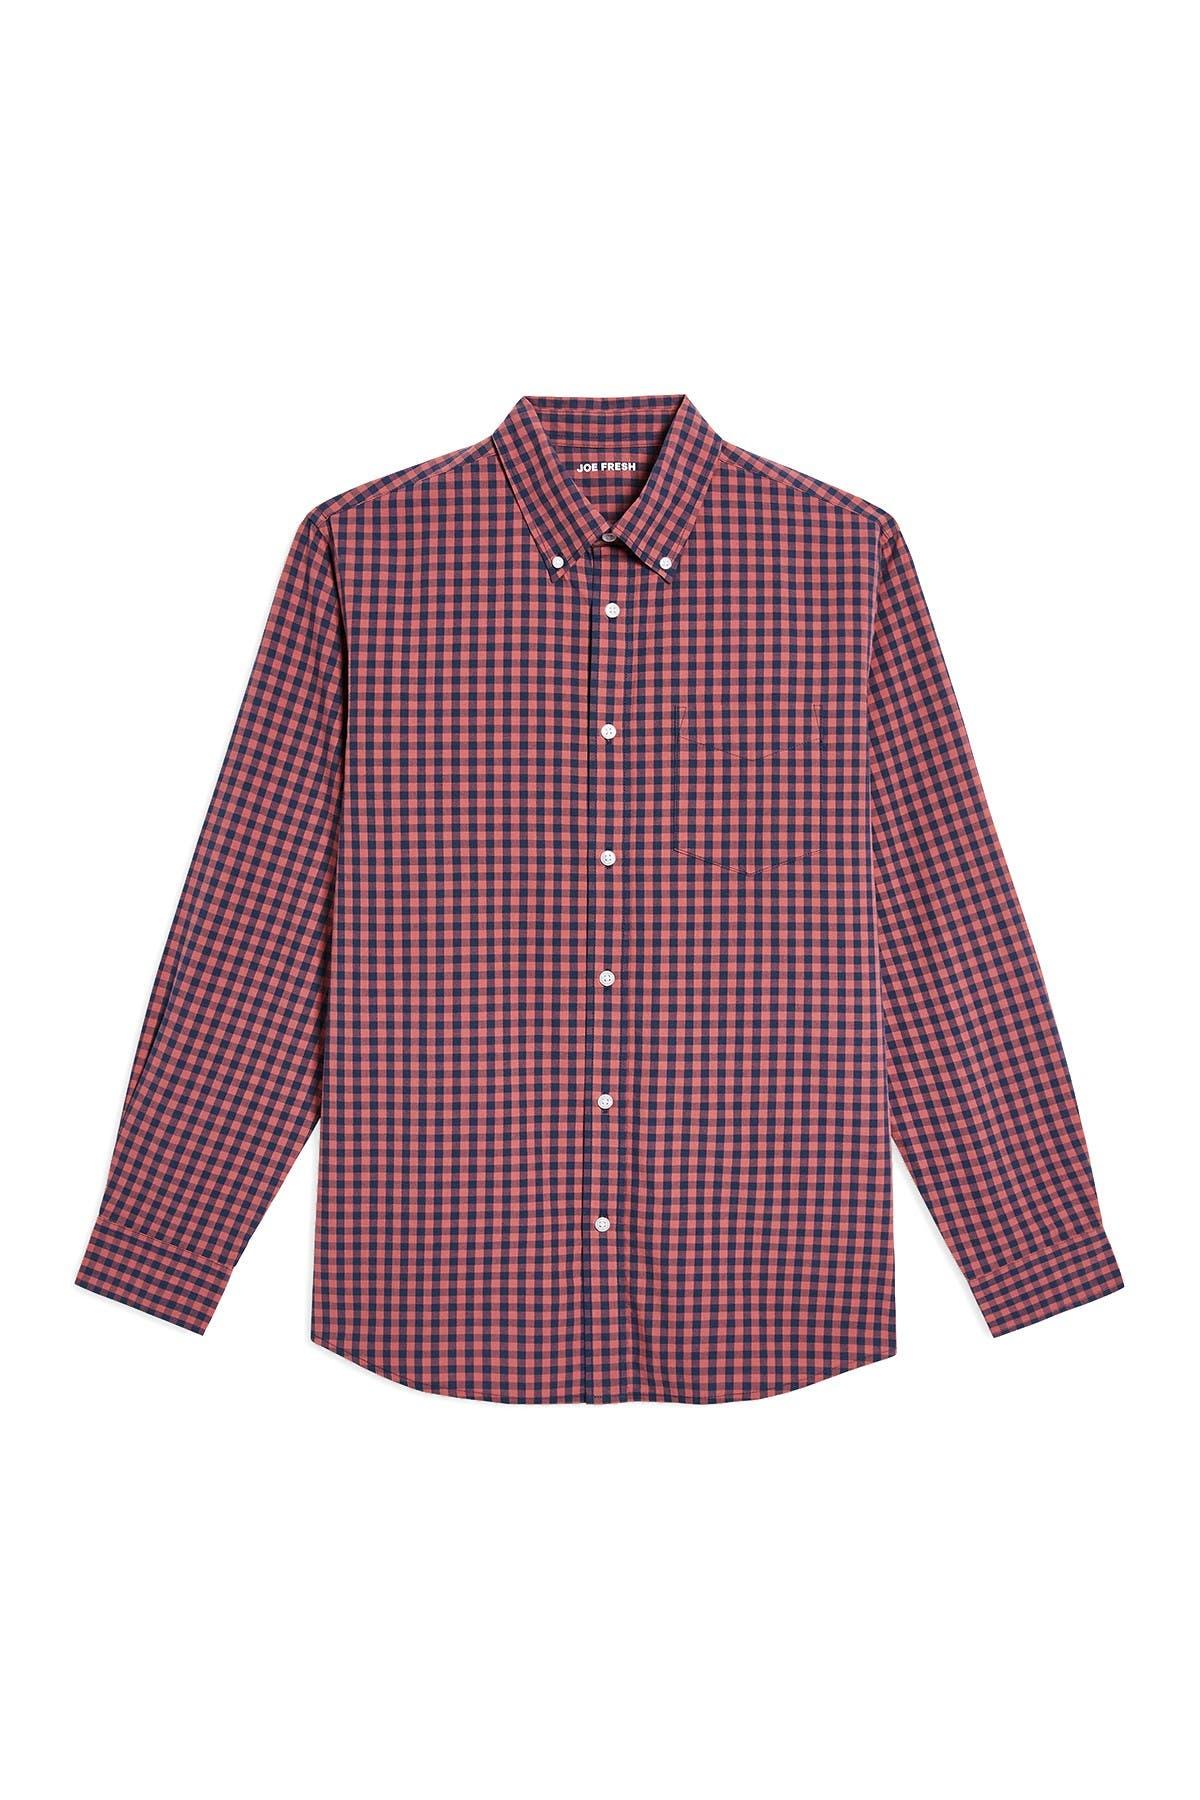 Image of Joe Fresh Gingham Print Long Sleeve Shirt